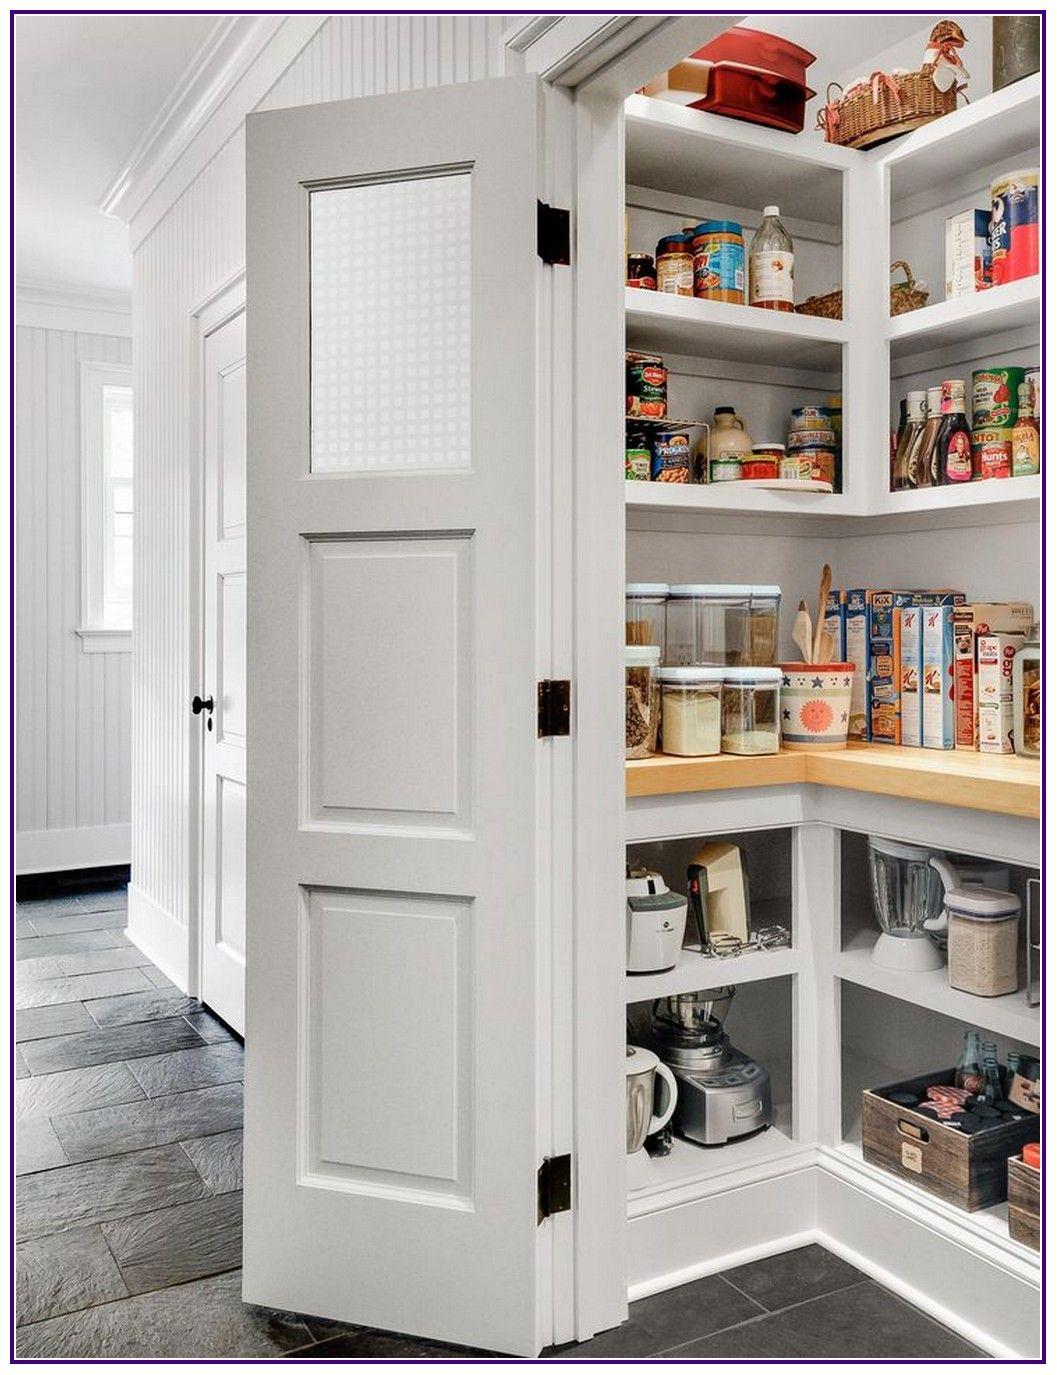 24 well kitchen organized and storage ideas 00001 kitchen pantry design pantry design pantry on organizing kitchen cabinets zones id=62784